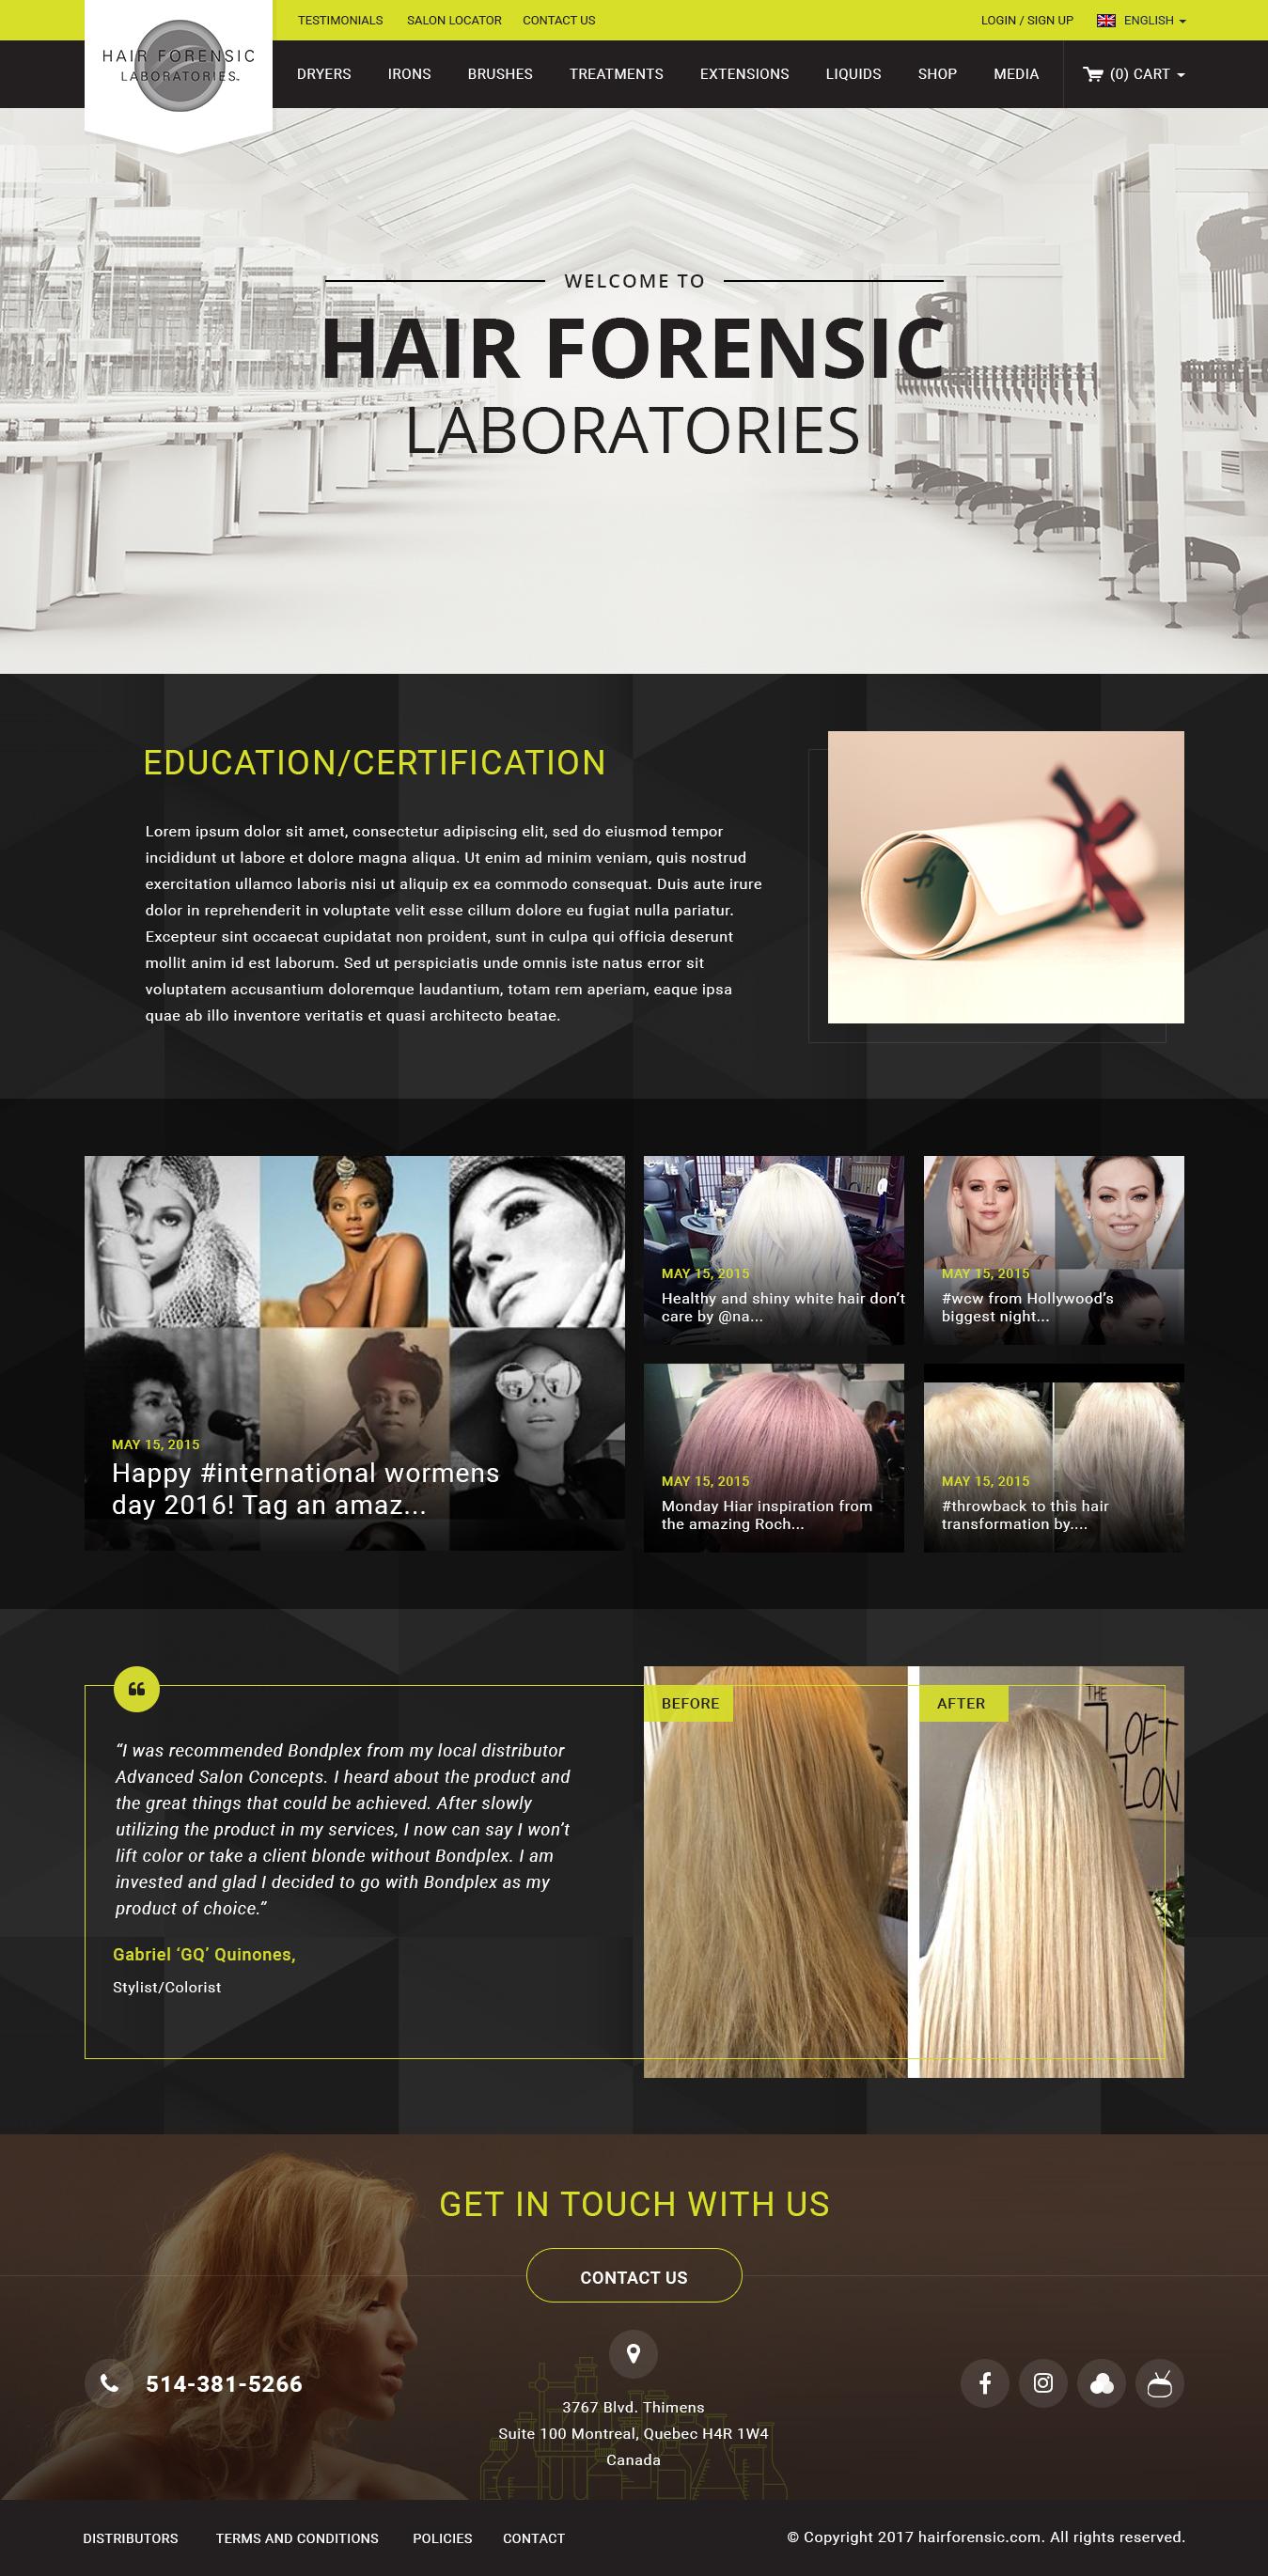 hair forensic